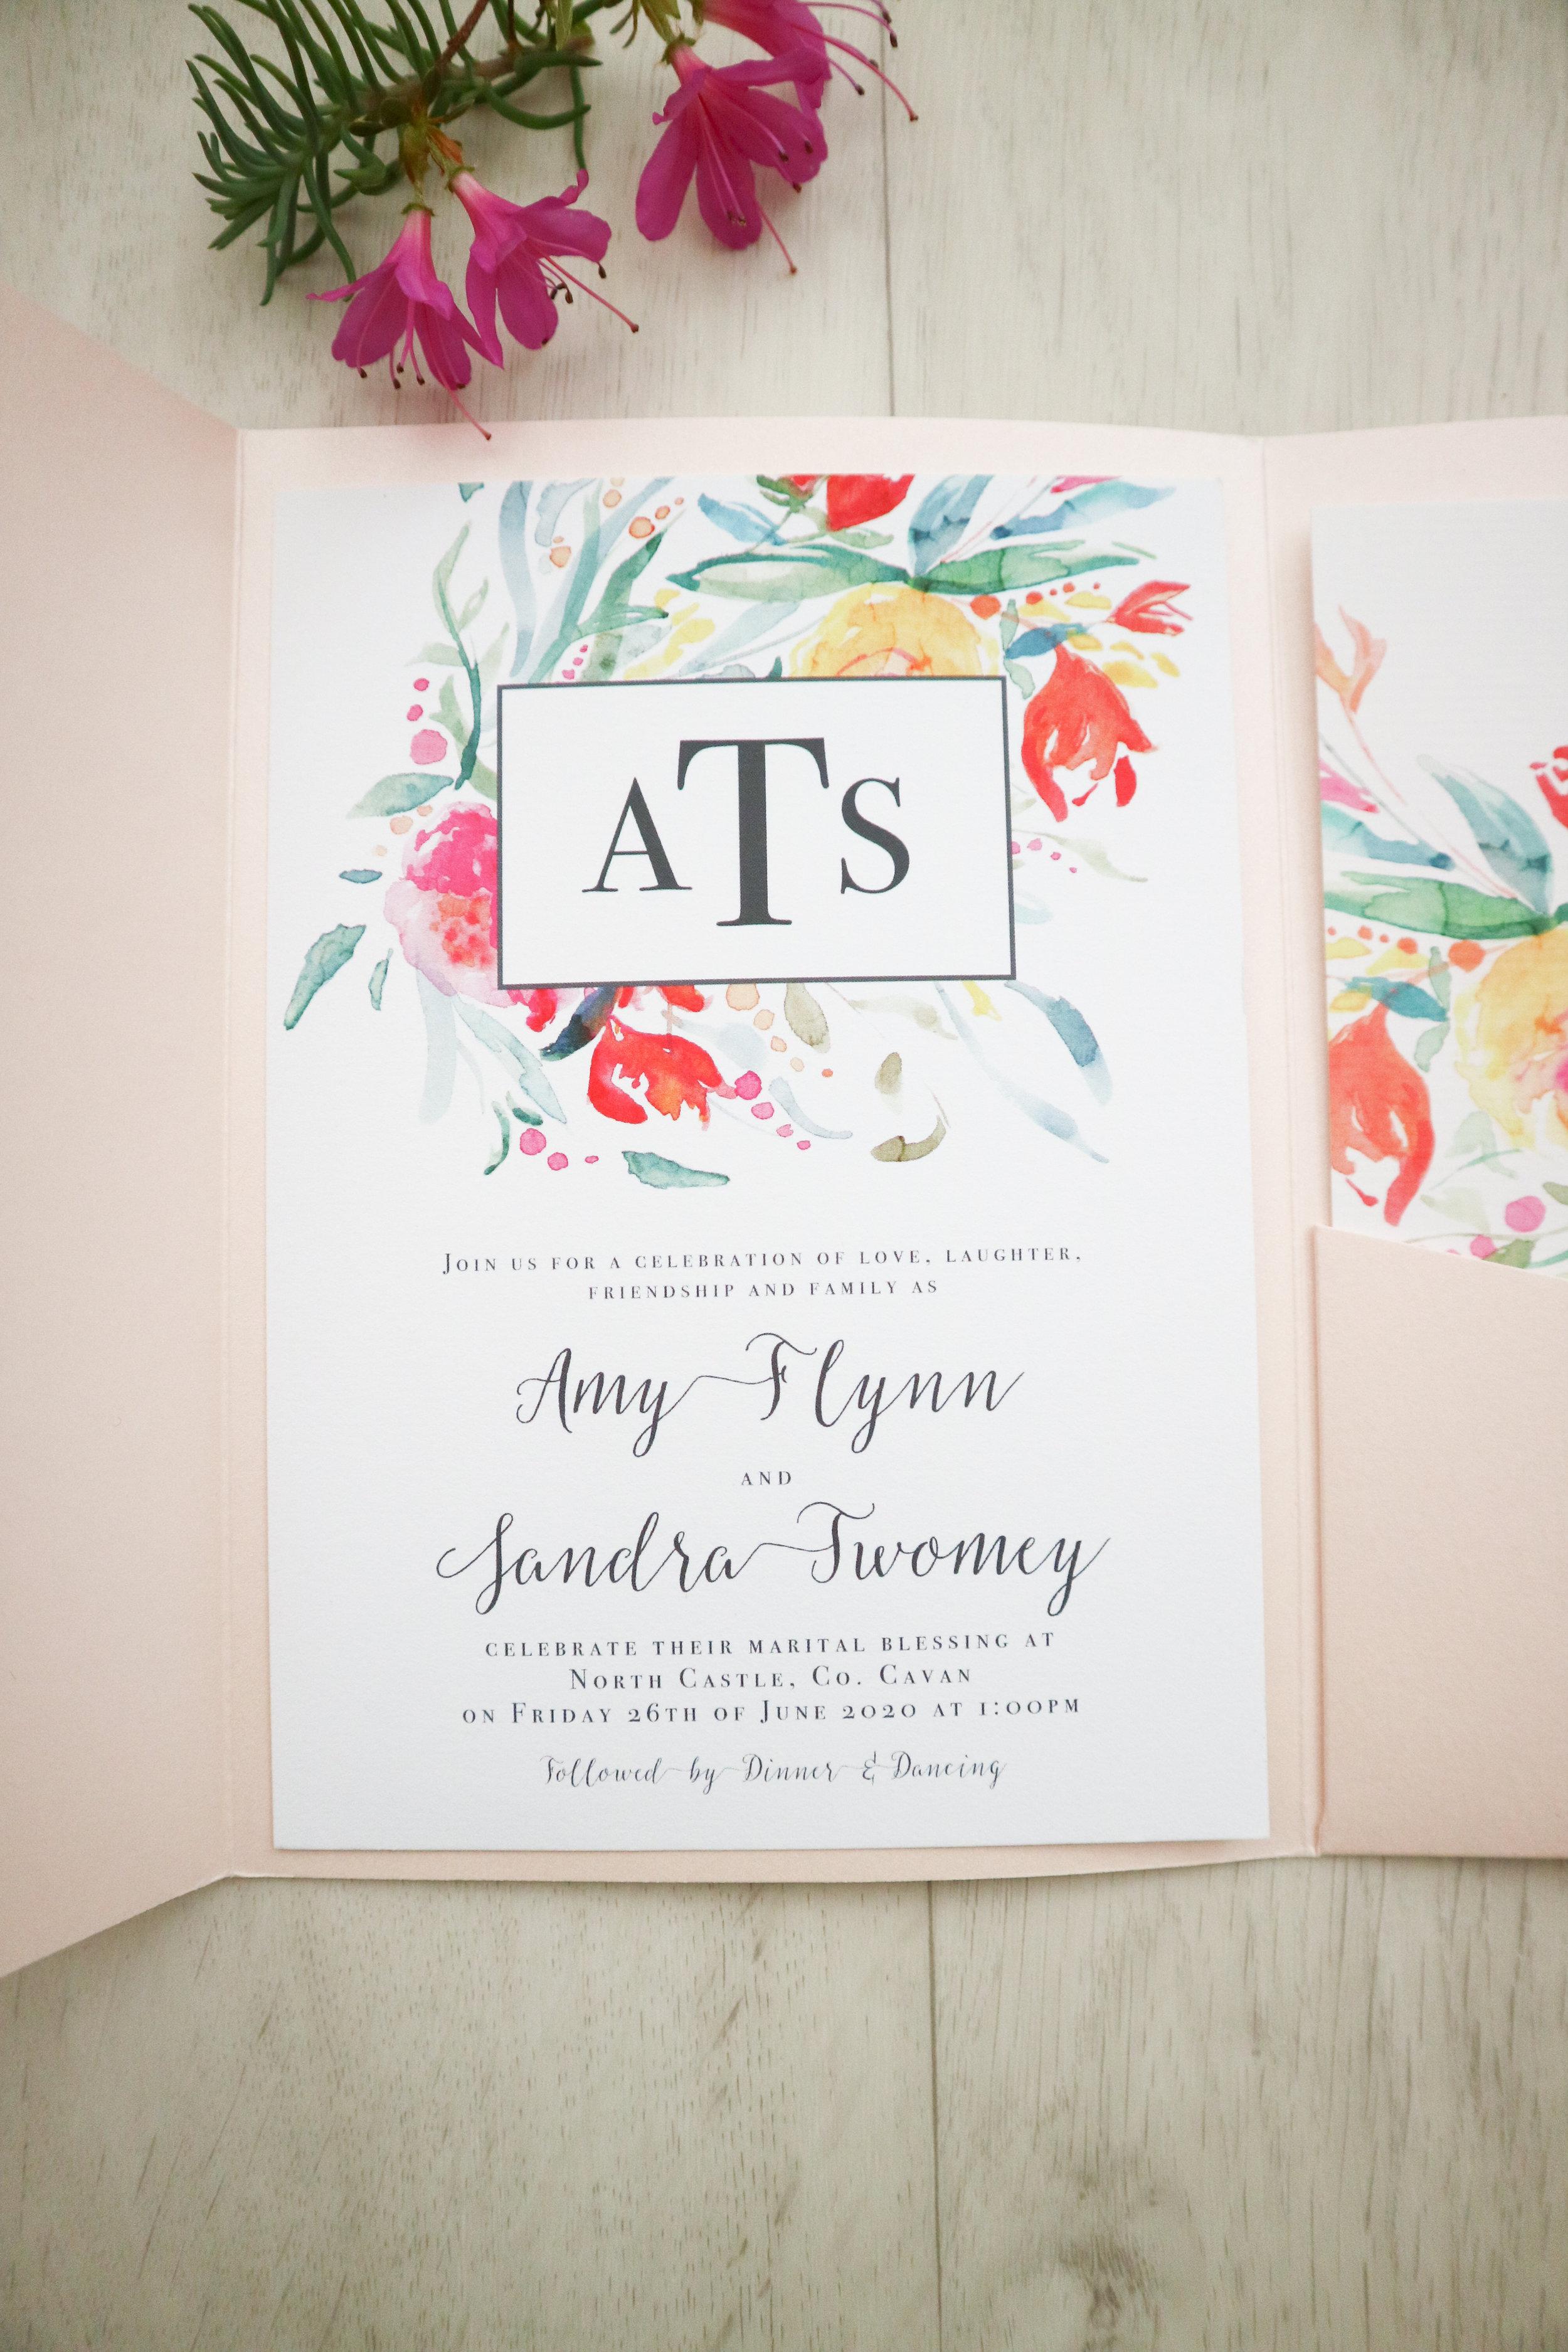 Little-Bow-Print-Wedding-Invitations-Waterford-Eden-photography-Boquet-Monogram-Confetti-11.jpg